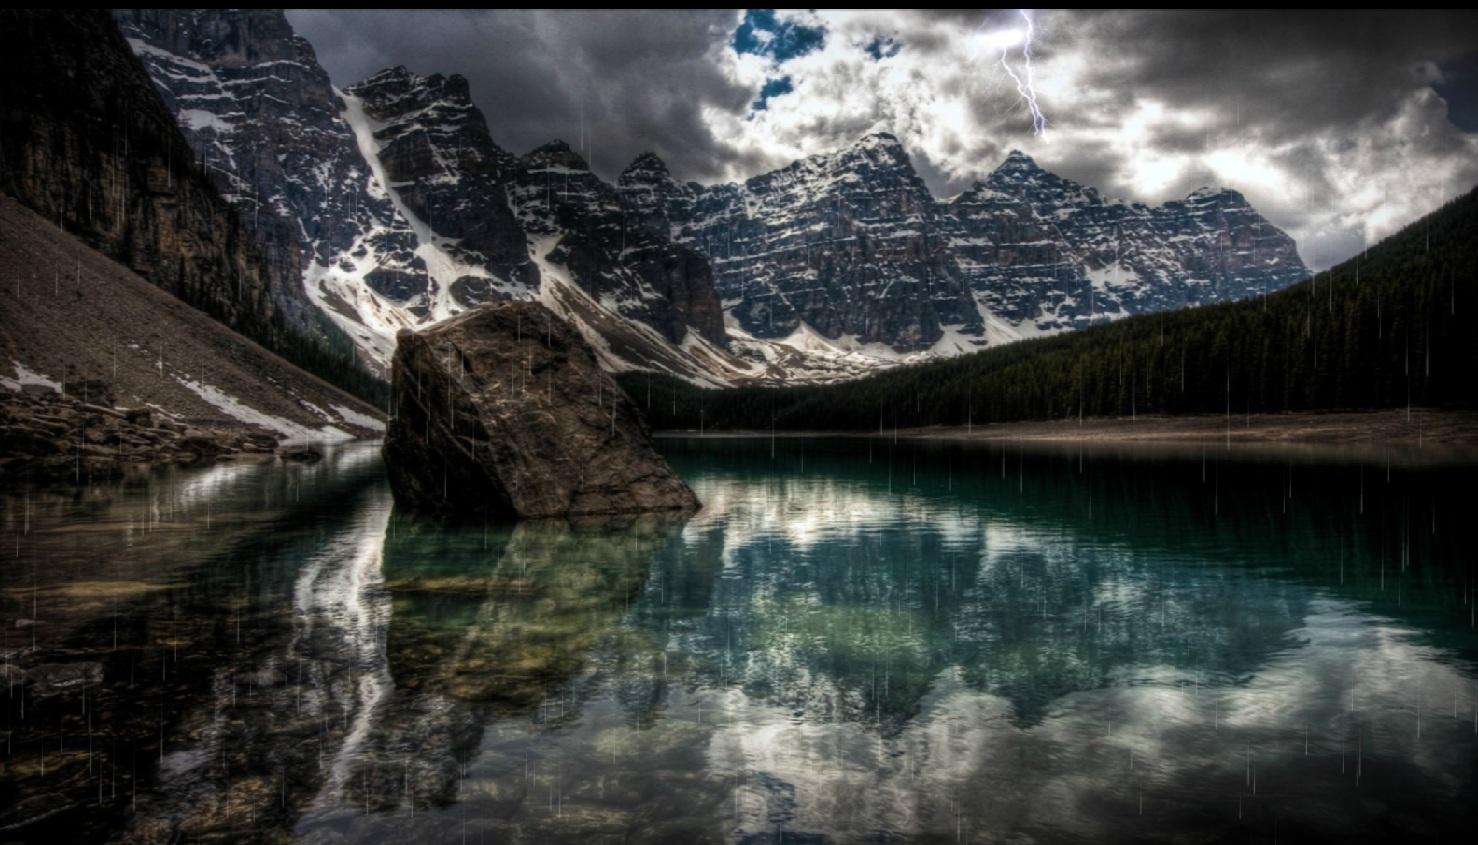 Beautiful Wallpaper Mountain Rain - Mountain_Rainstorm_Preview  Snapshot_705370.jpg